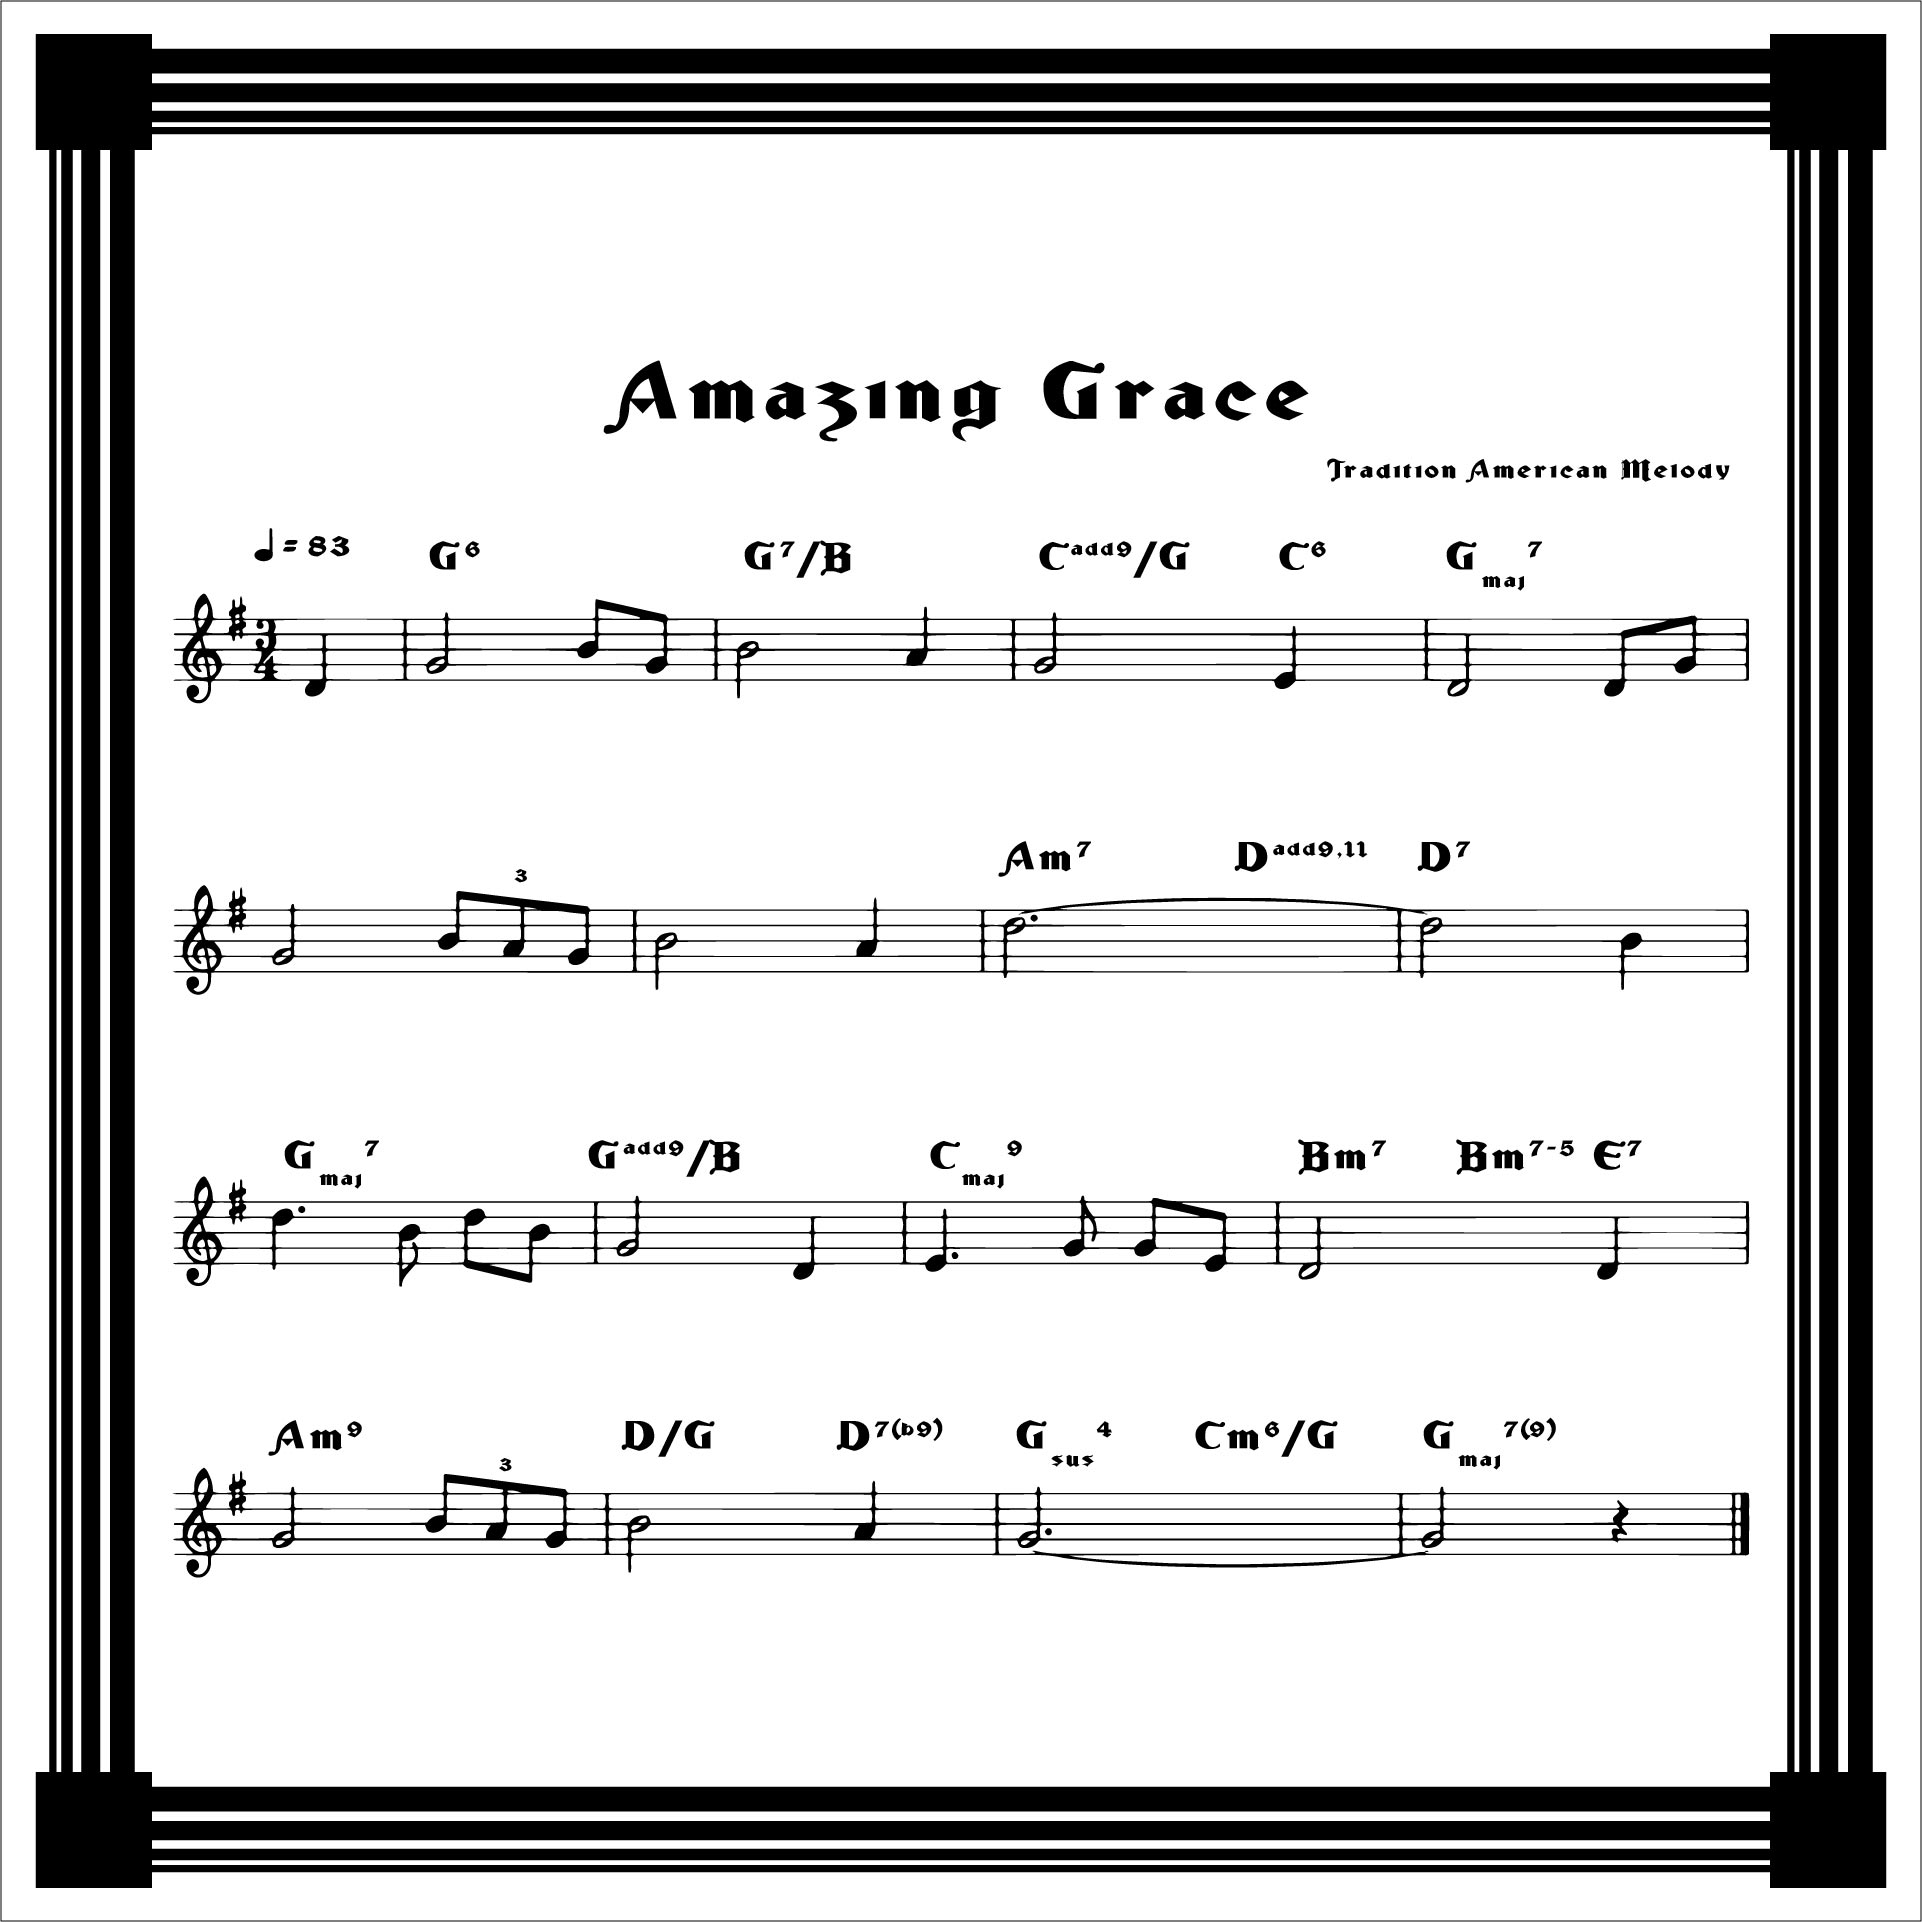 Best 25 Amazing Grace Guitar Chords Ideas On Pinterest: Amazing Grace Hymn Sheet Music Pdf